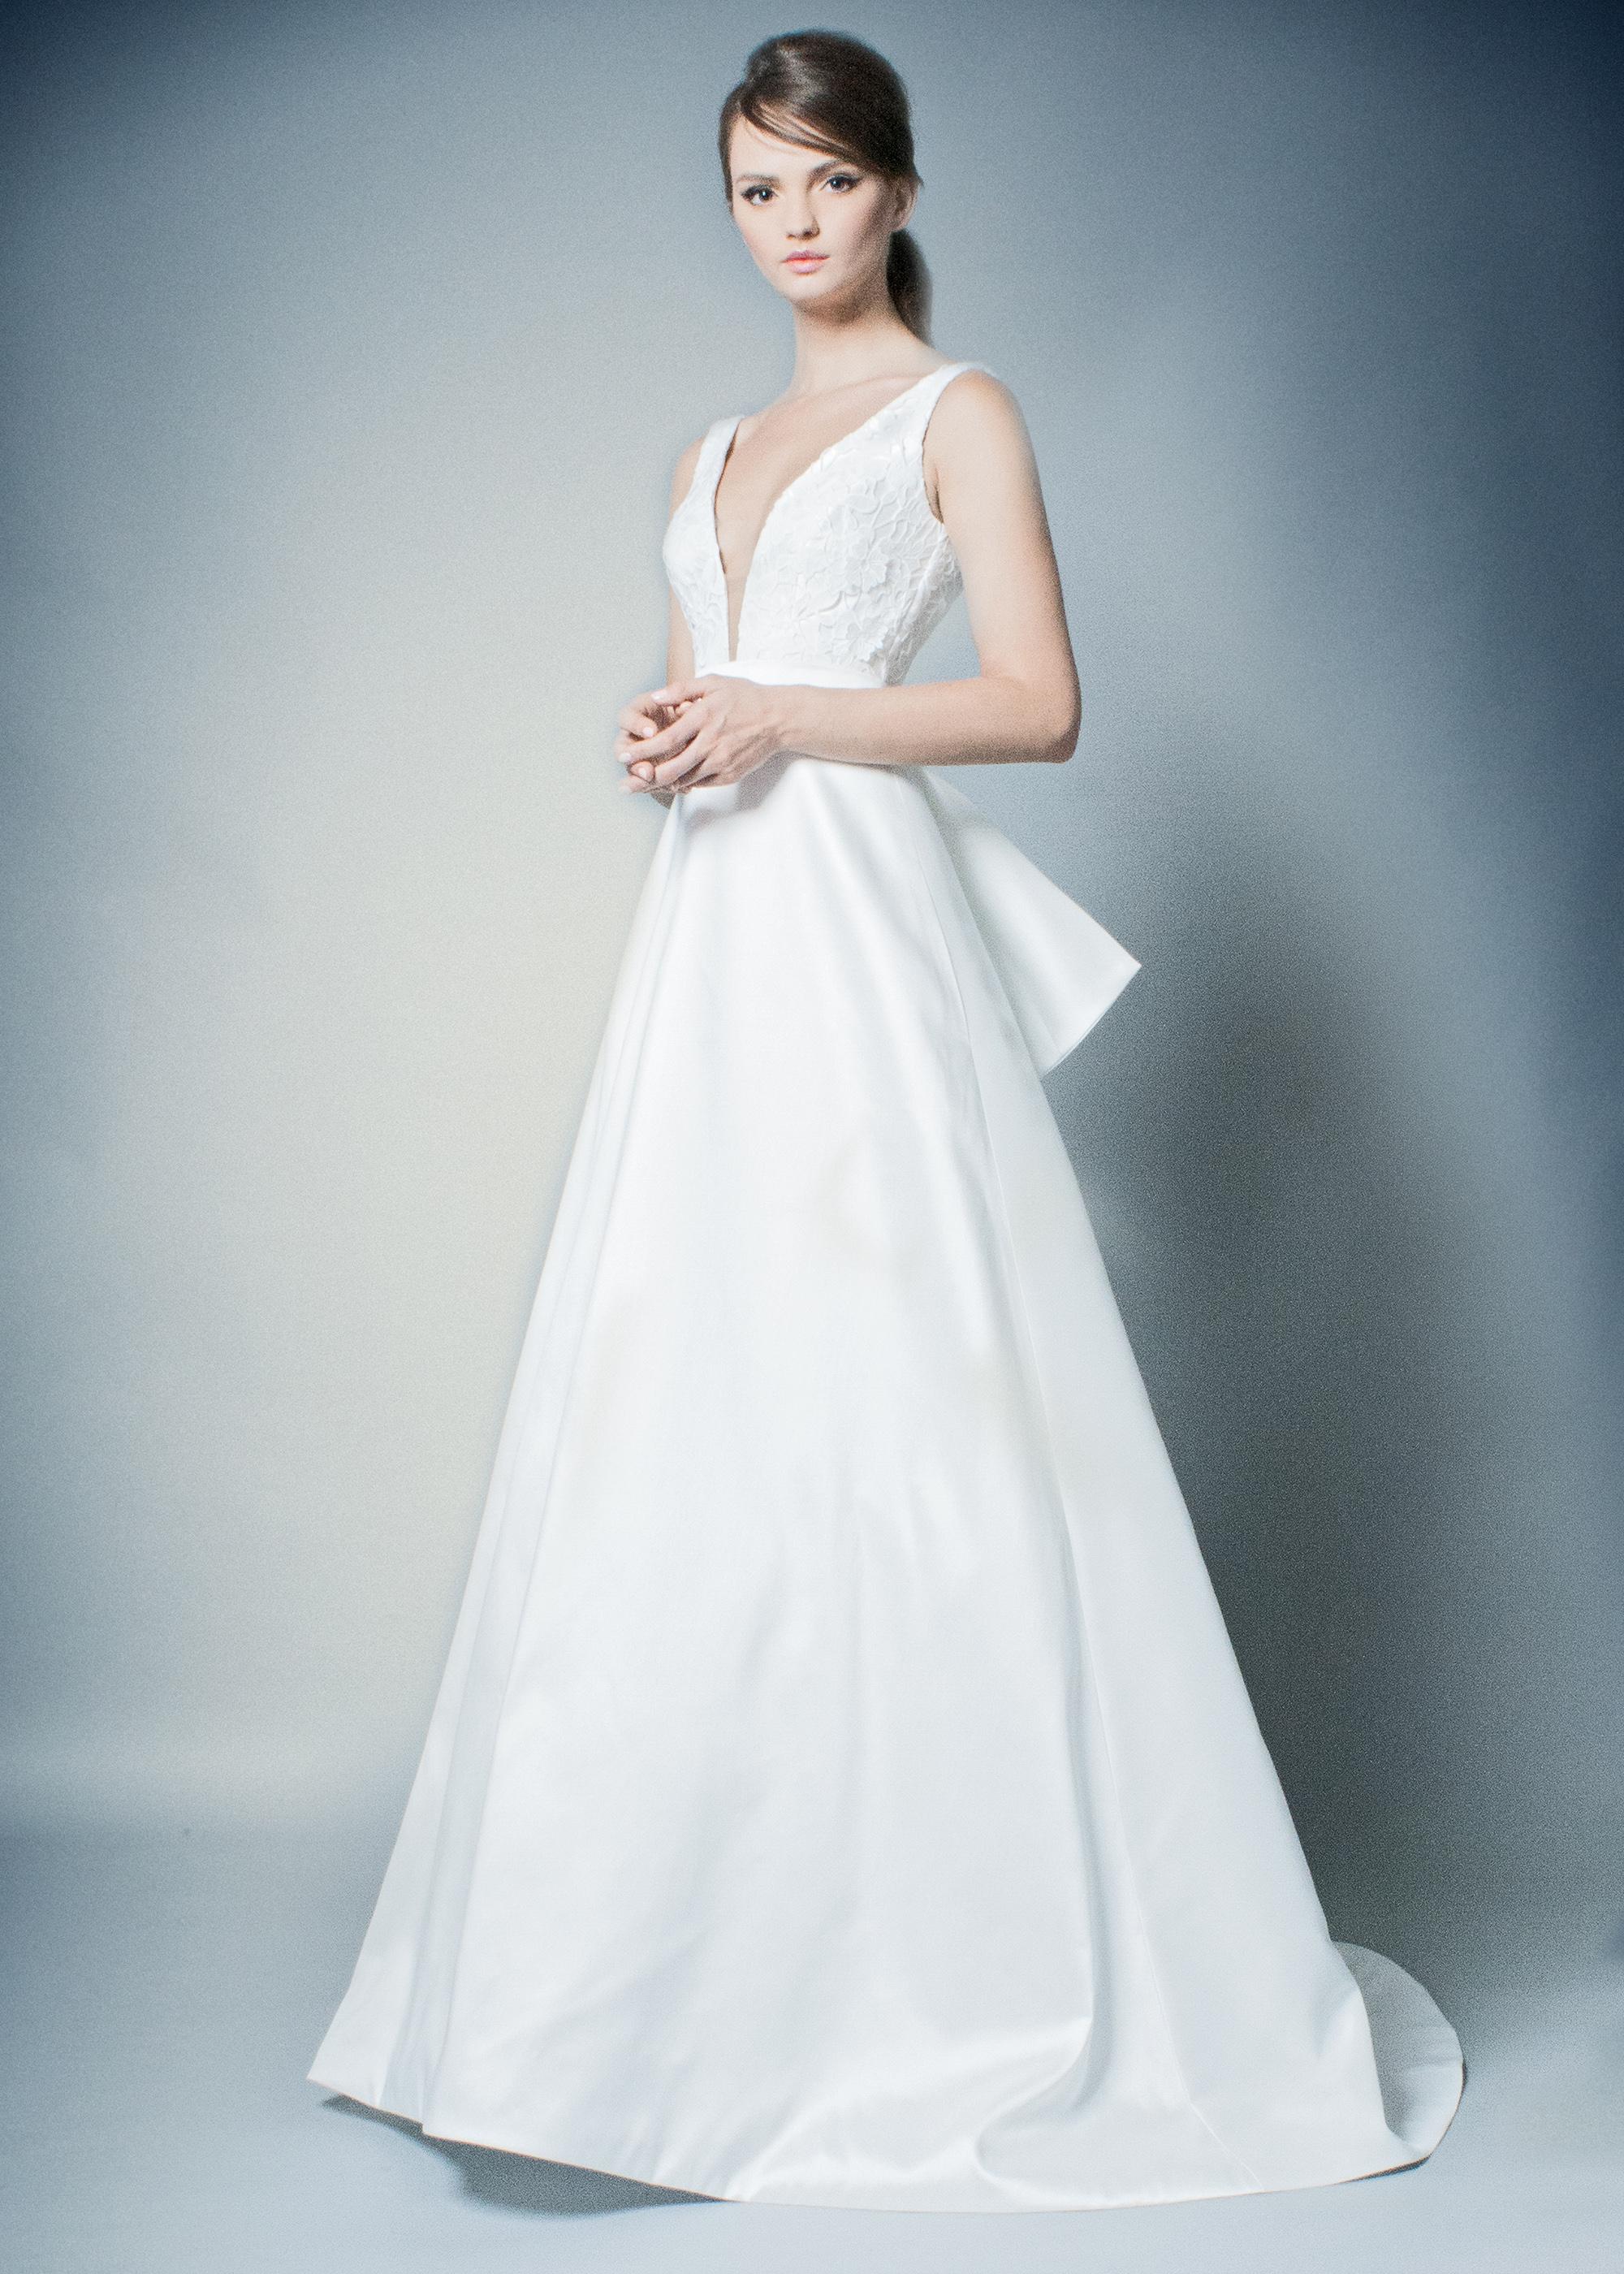 romona wedding dress spring 2019 deep v-neck a-line gown